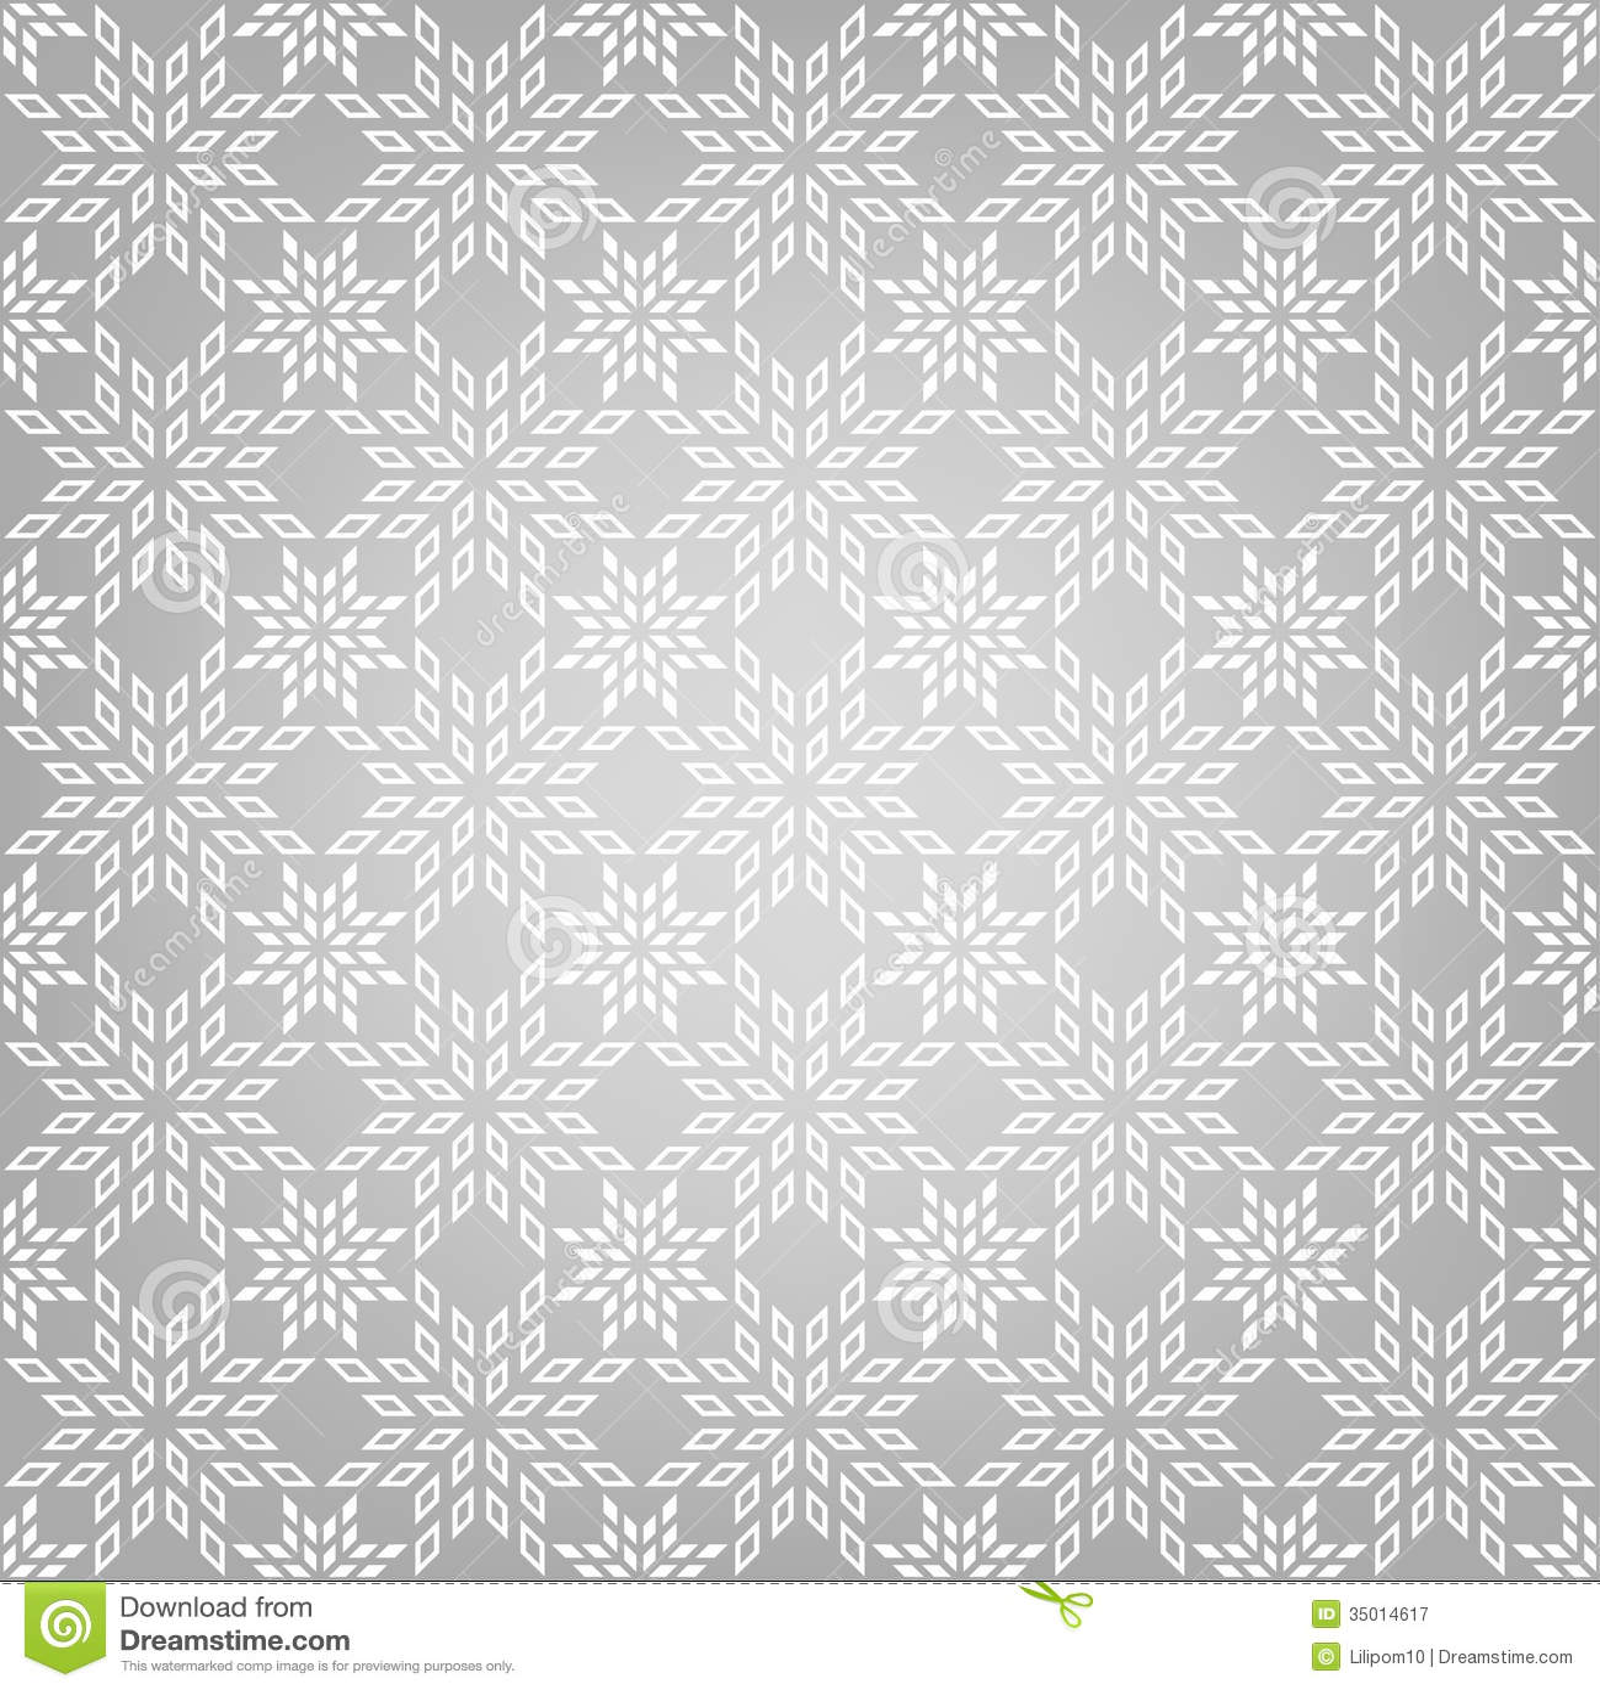 For textiles interior design for book design website background